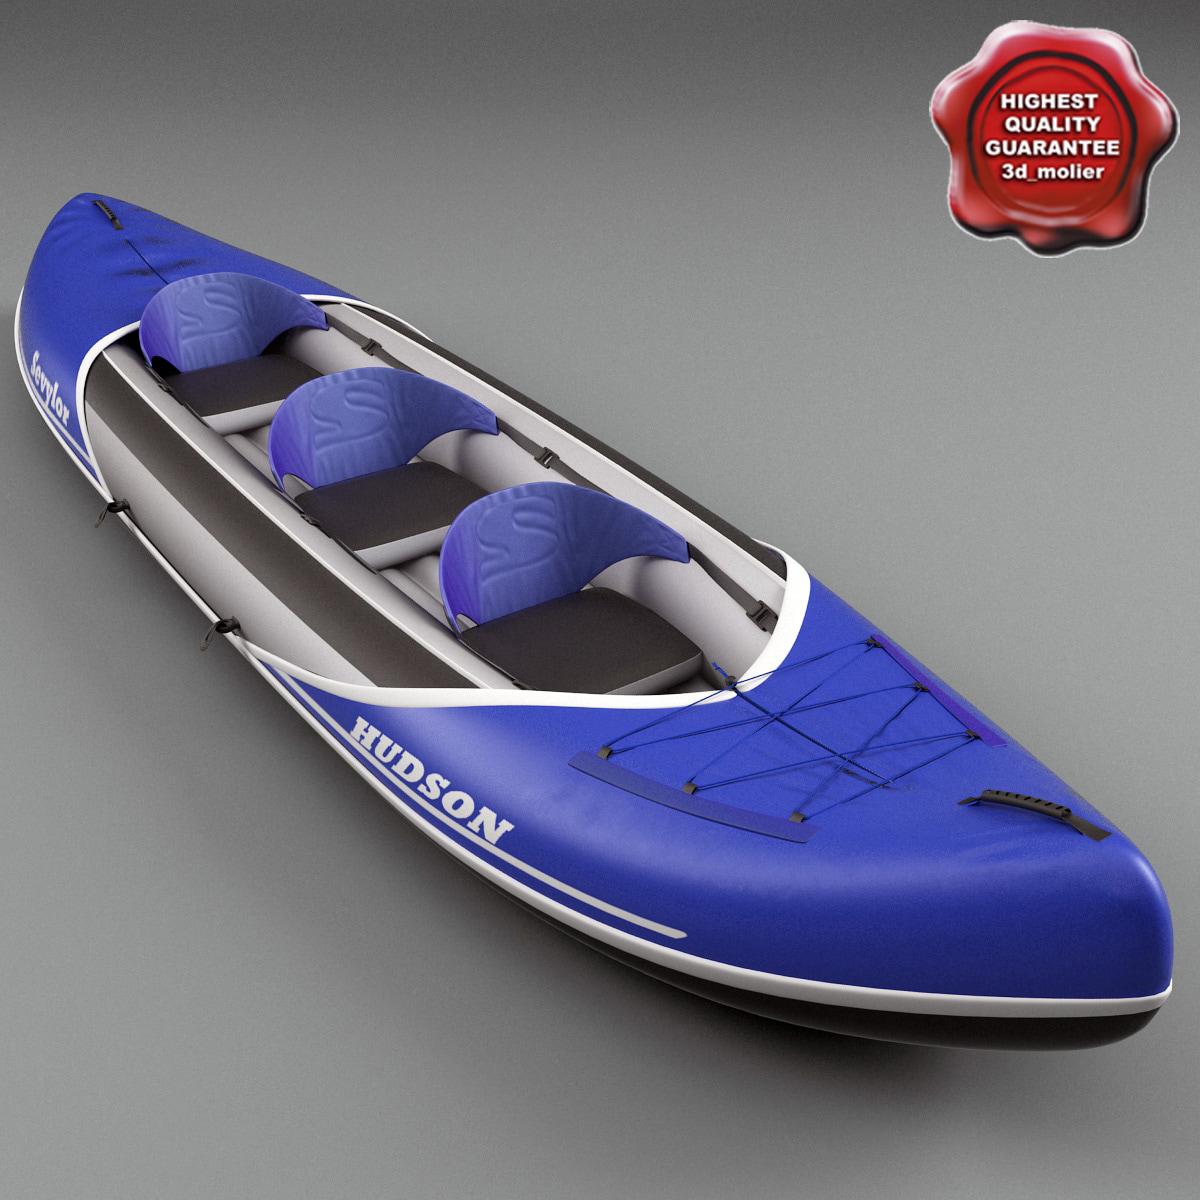 Kayak_Sevylor_Hudson_00.jpg